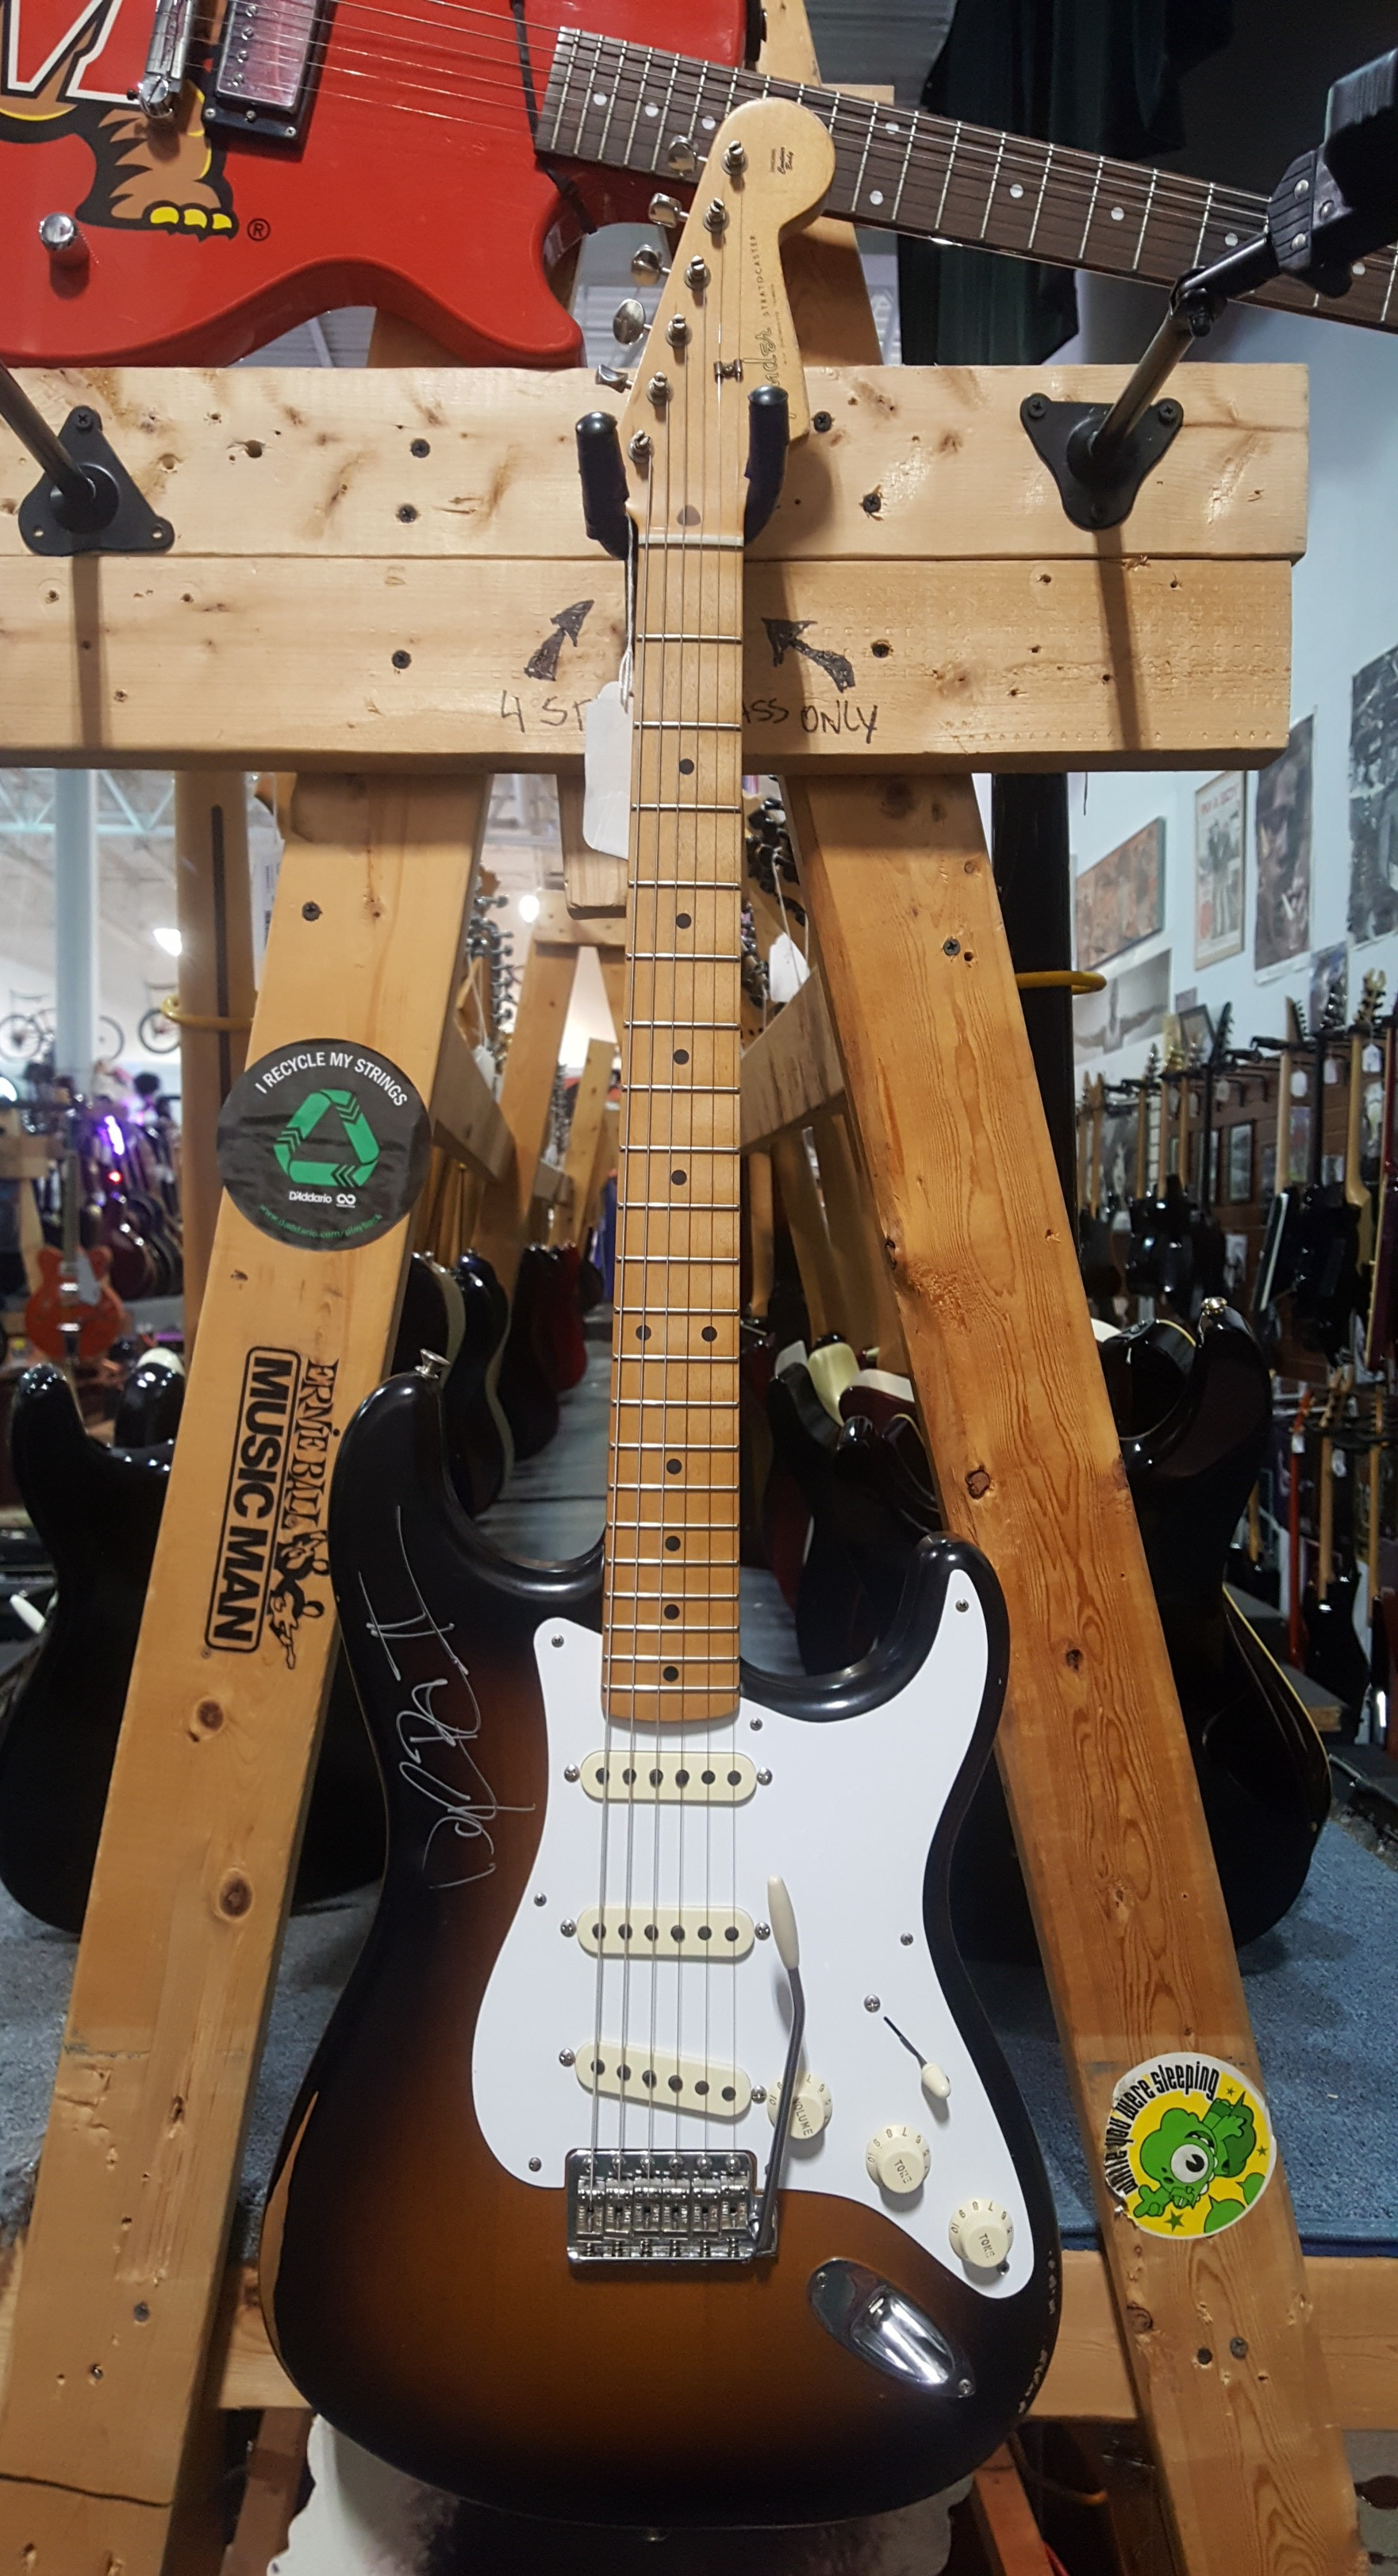 2016 FENDER ROAD WORN '50s STRATOCASTER MIM Electric Guitar - 2-Color Sunburst!